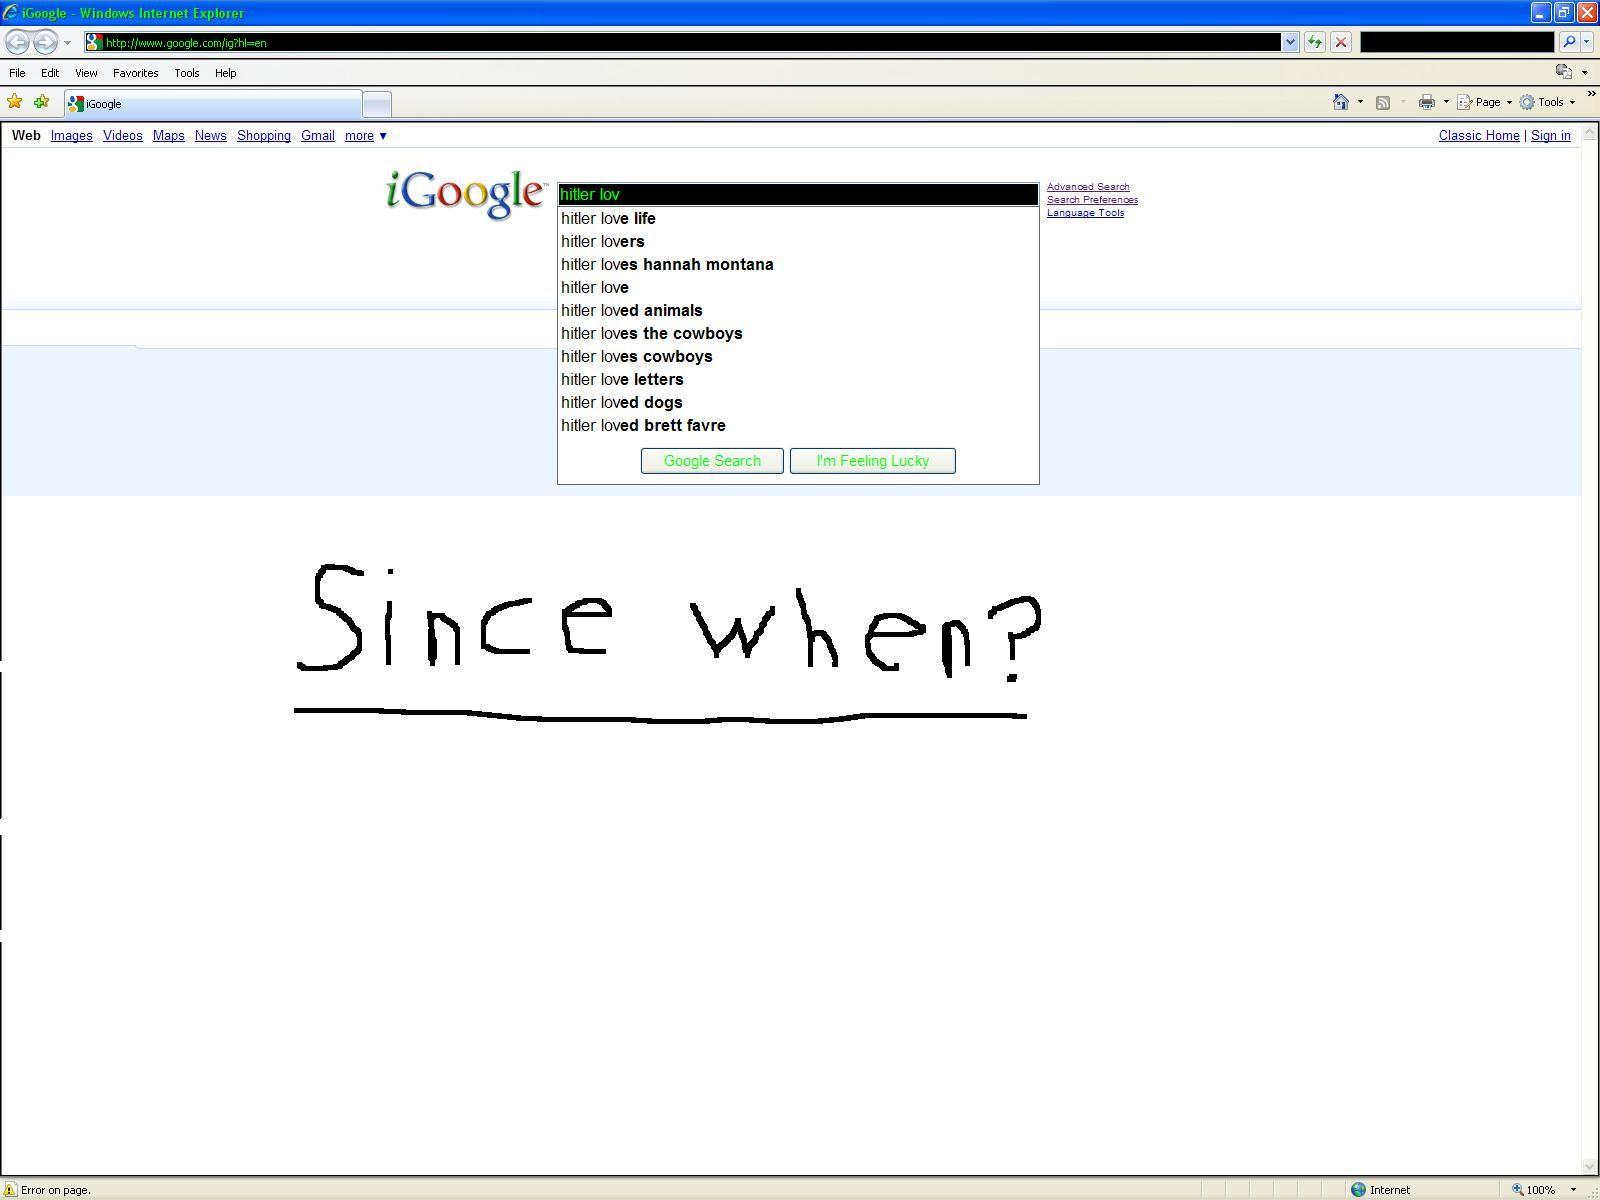 flirting meme images google search history